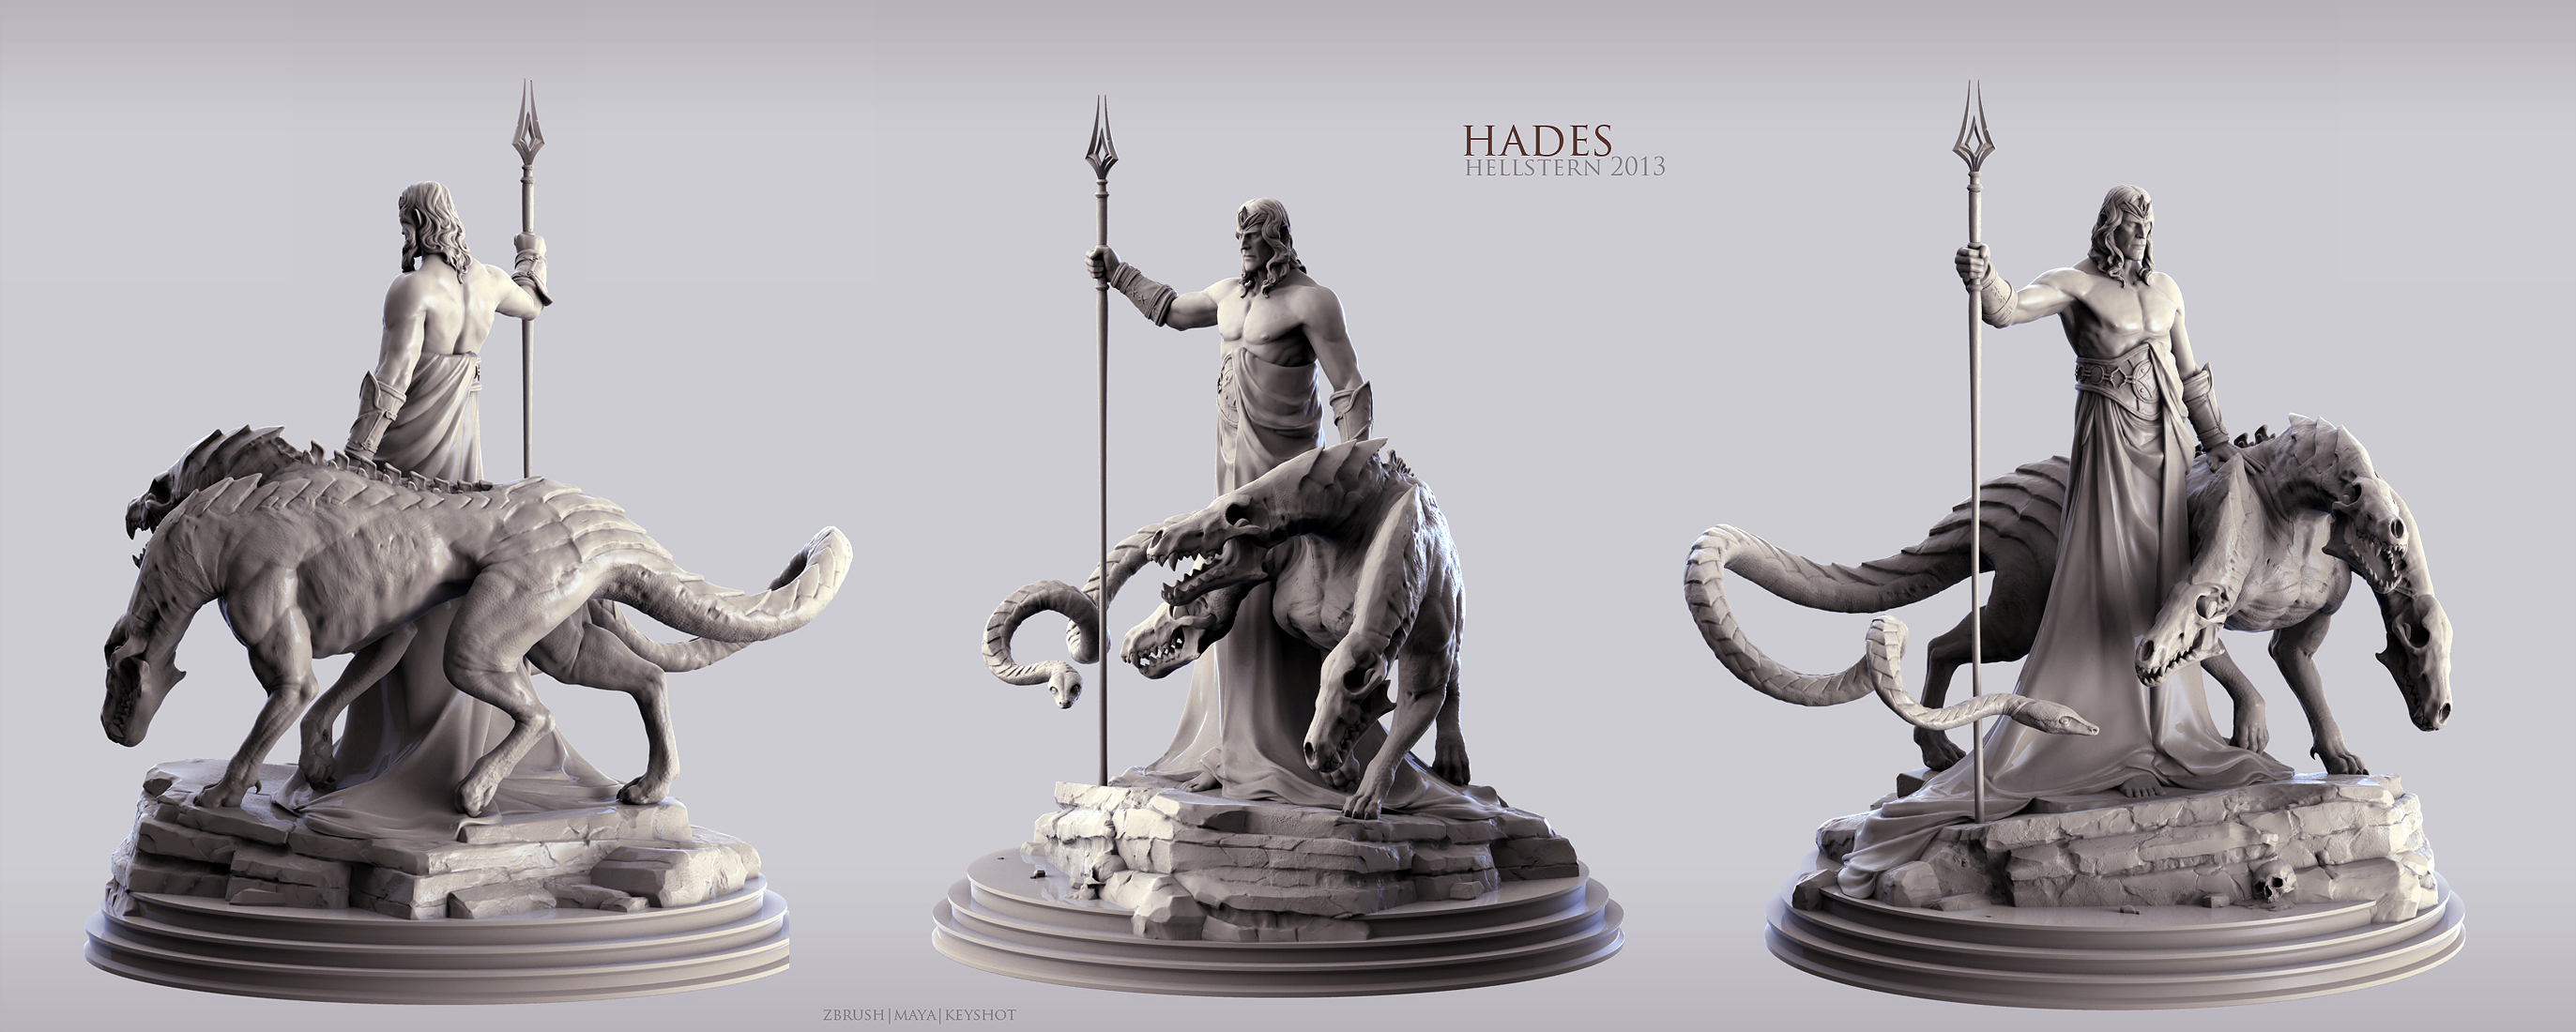 Hades add shots by Hellstern on DeviantArt